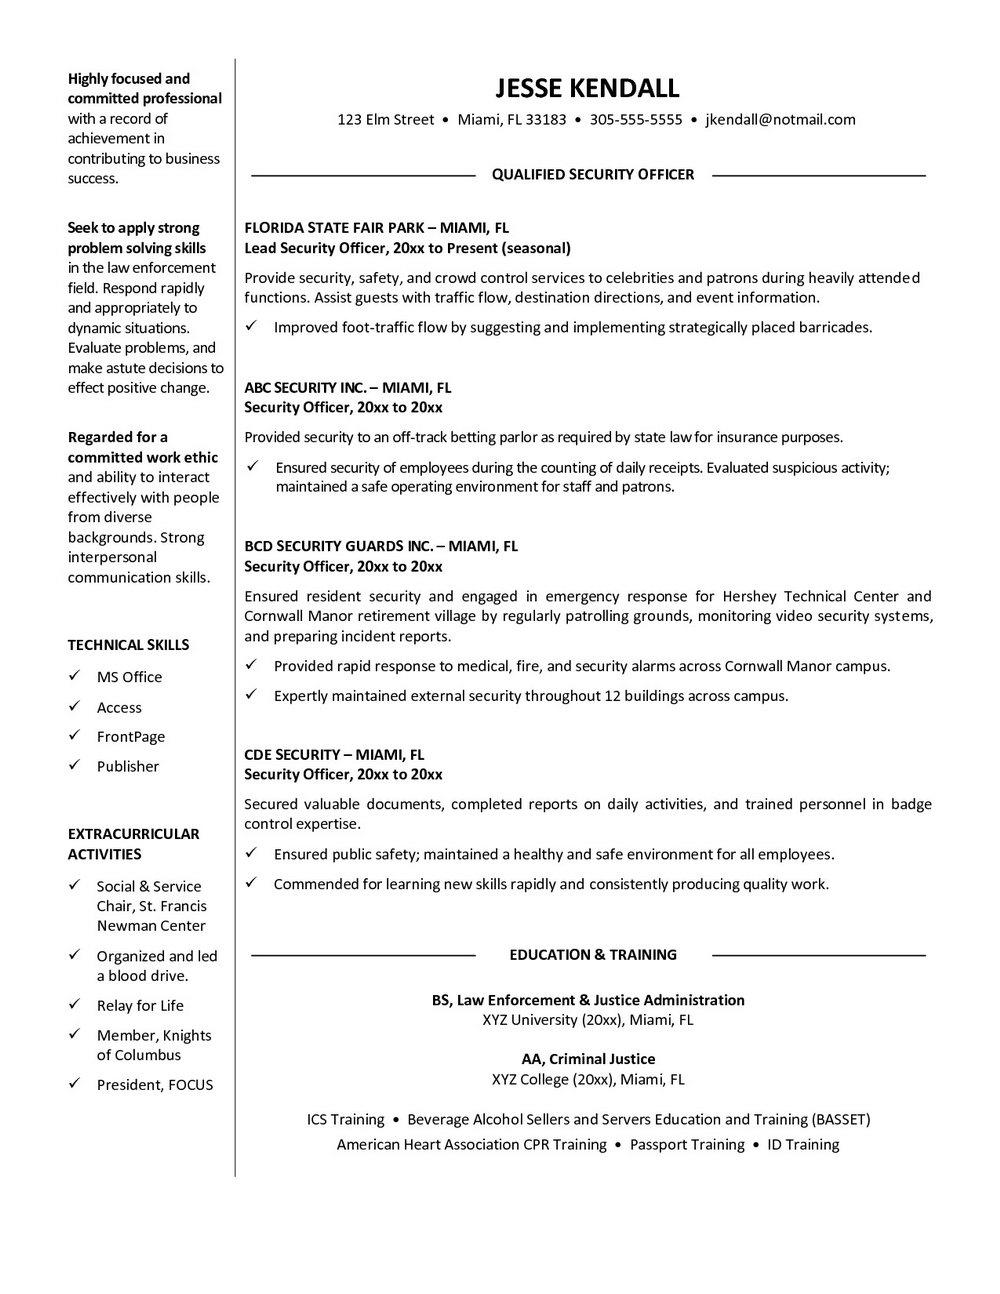 Security Guard Resume Format Pdf